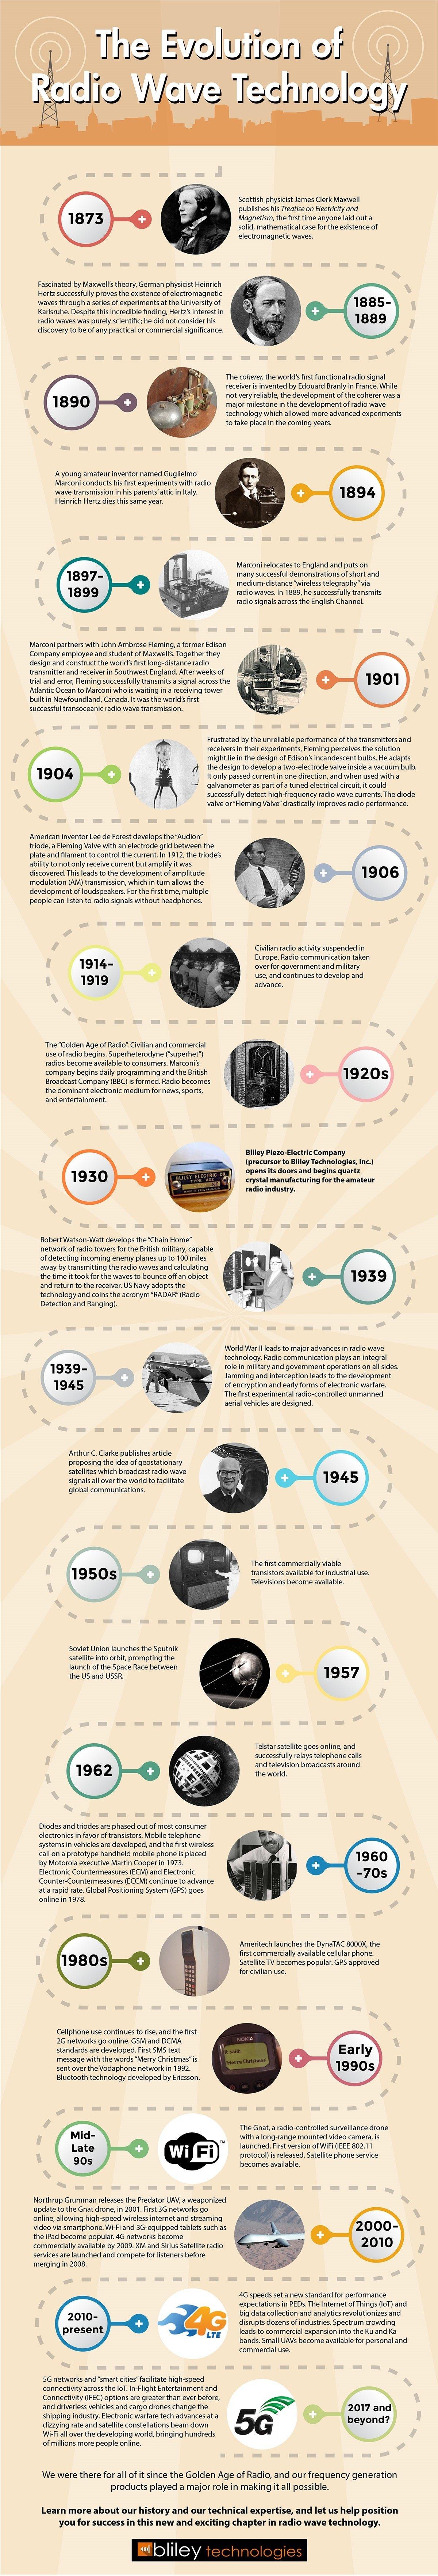 Evolution of Radio Wave Technology infographic.jpg